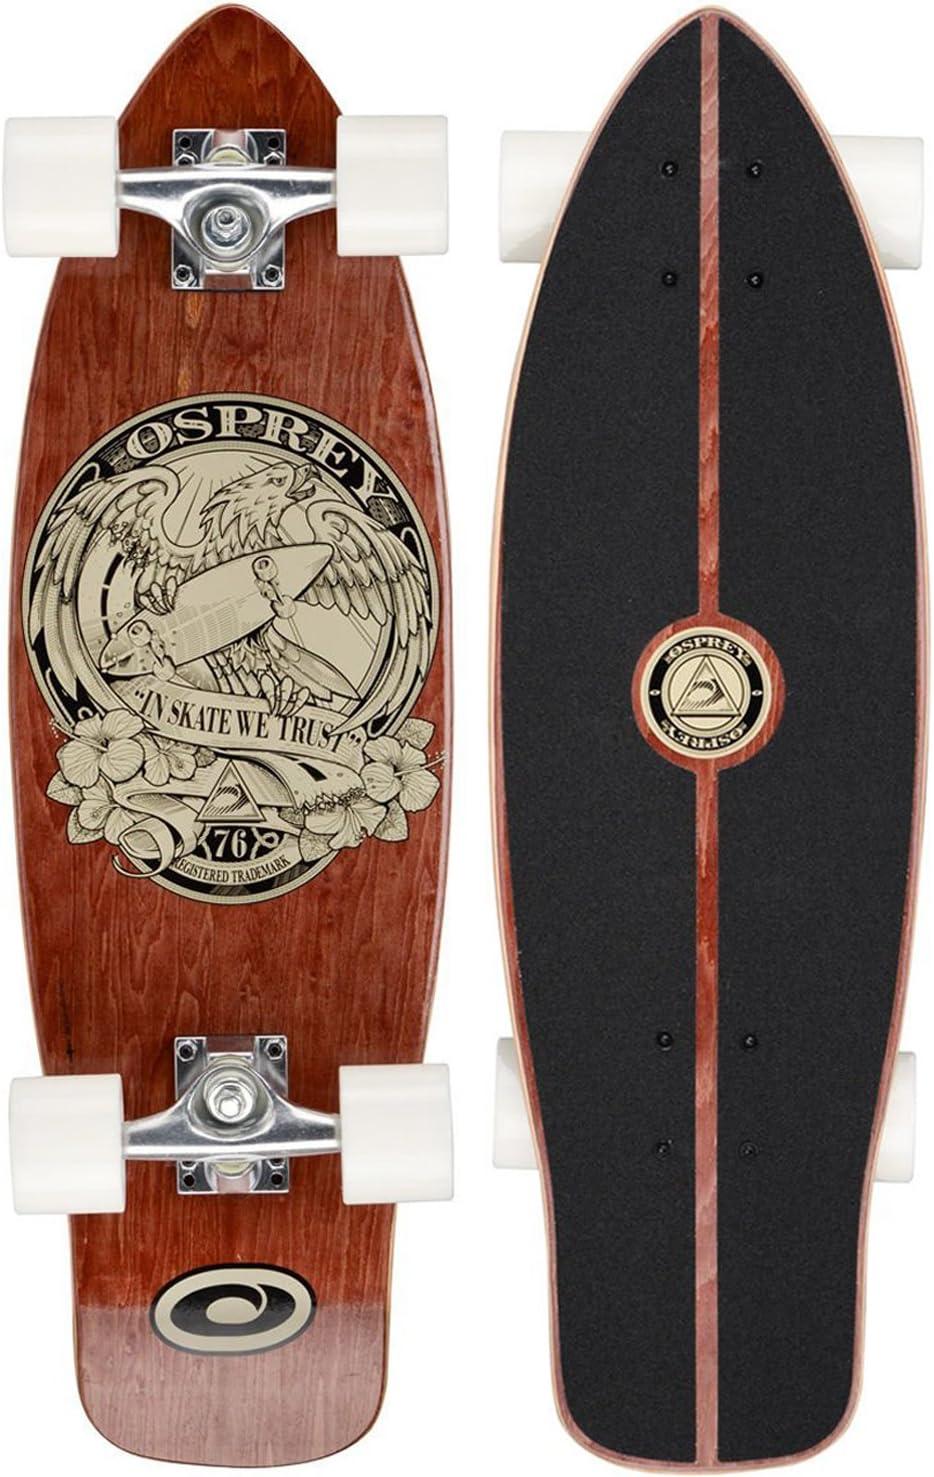 Osprey TY5343 Mini Cruiser 'In Skate We Trust' - Skateboard, color marrón, talla UK: 27 3/4 Inch